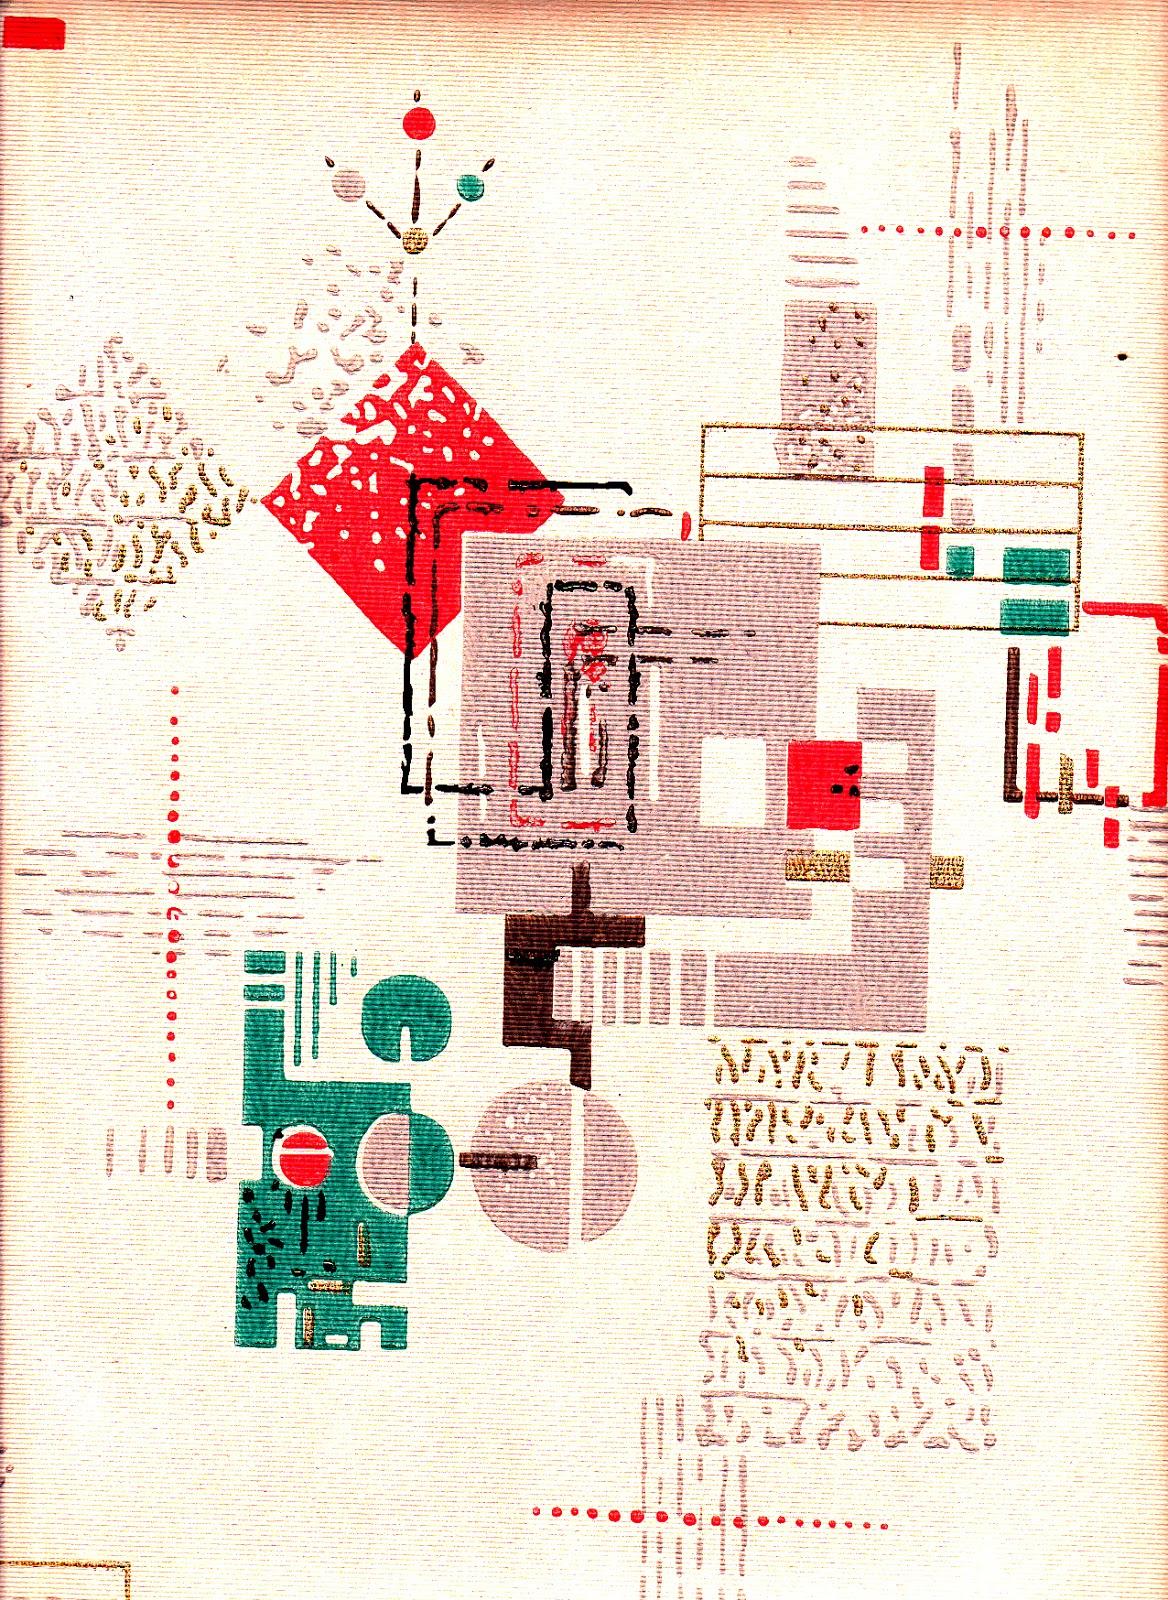 http://2.bp.blogspot.com/-Fno5RNXYYM8/UTjm2WQUFkI/AAAAAAAAB5A/Zyf2P_wb1X0/s1600/more+vintage+wallpaper_0008.jpg